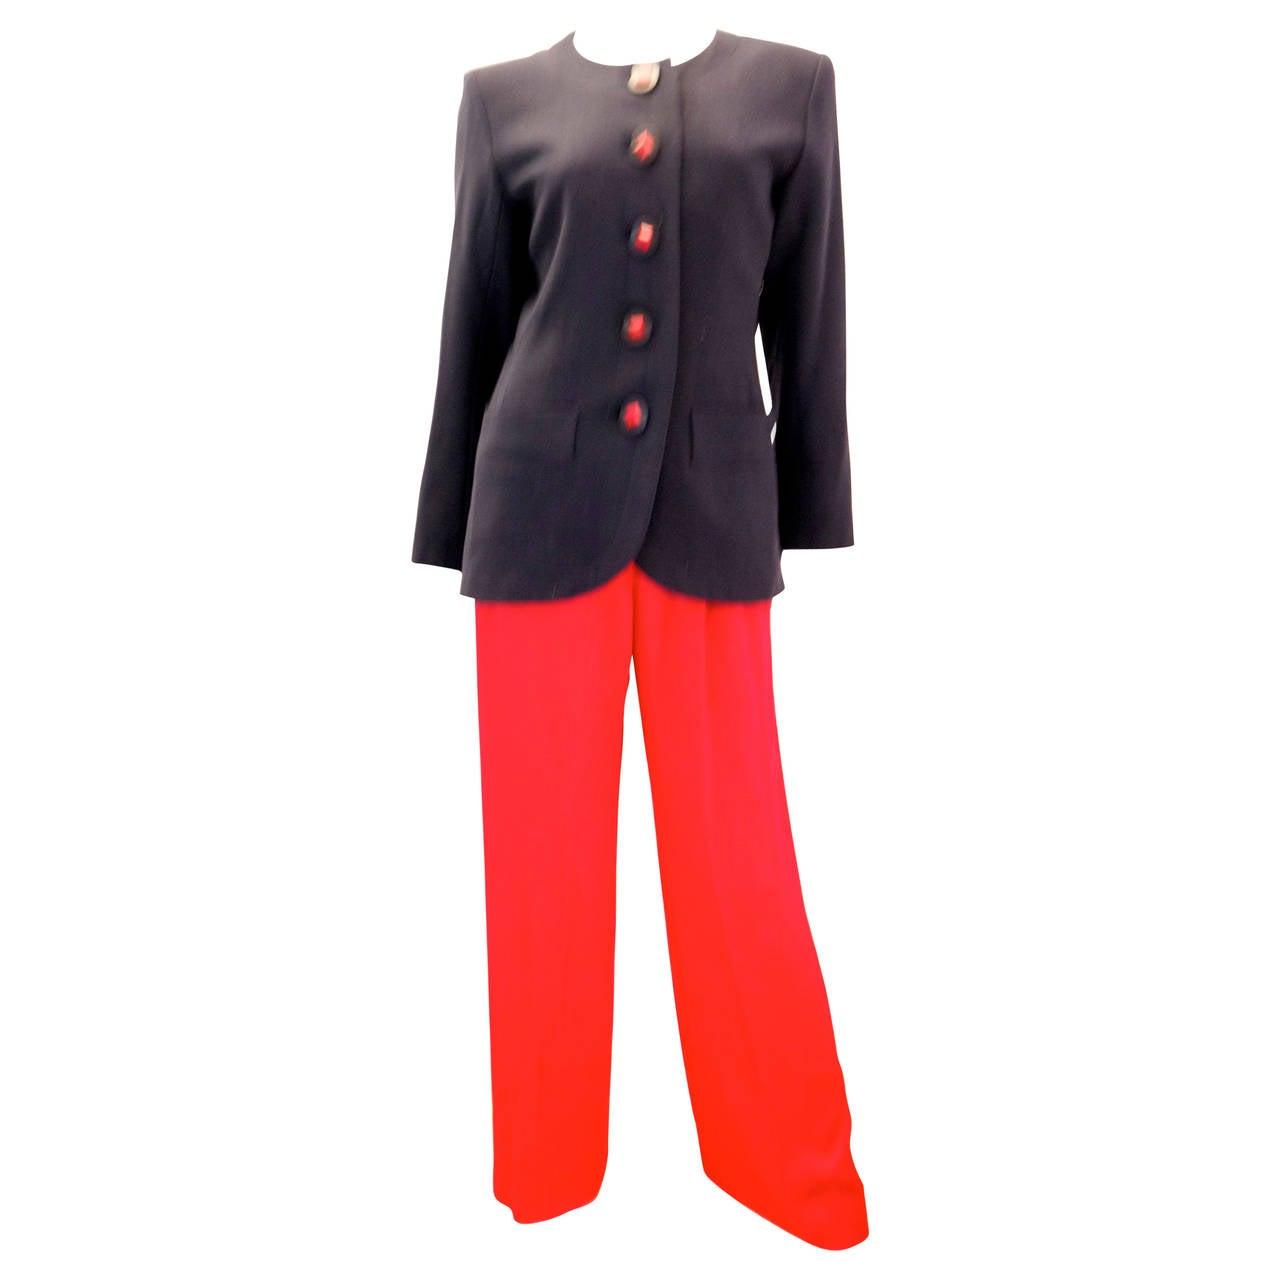 Yves Saint Laurent (YSL) Suit - Black Jacket with Red Pants